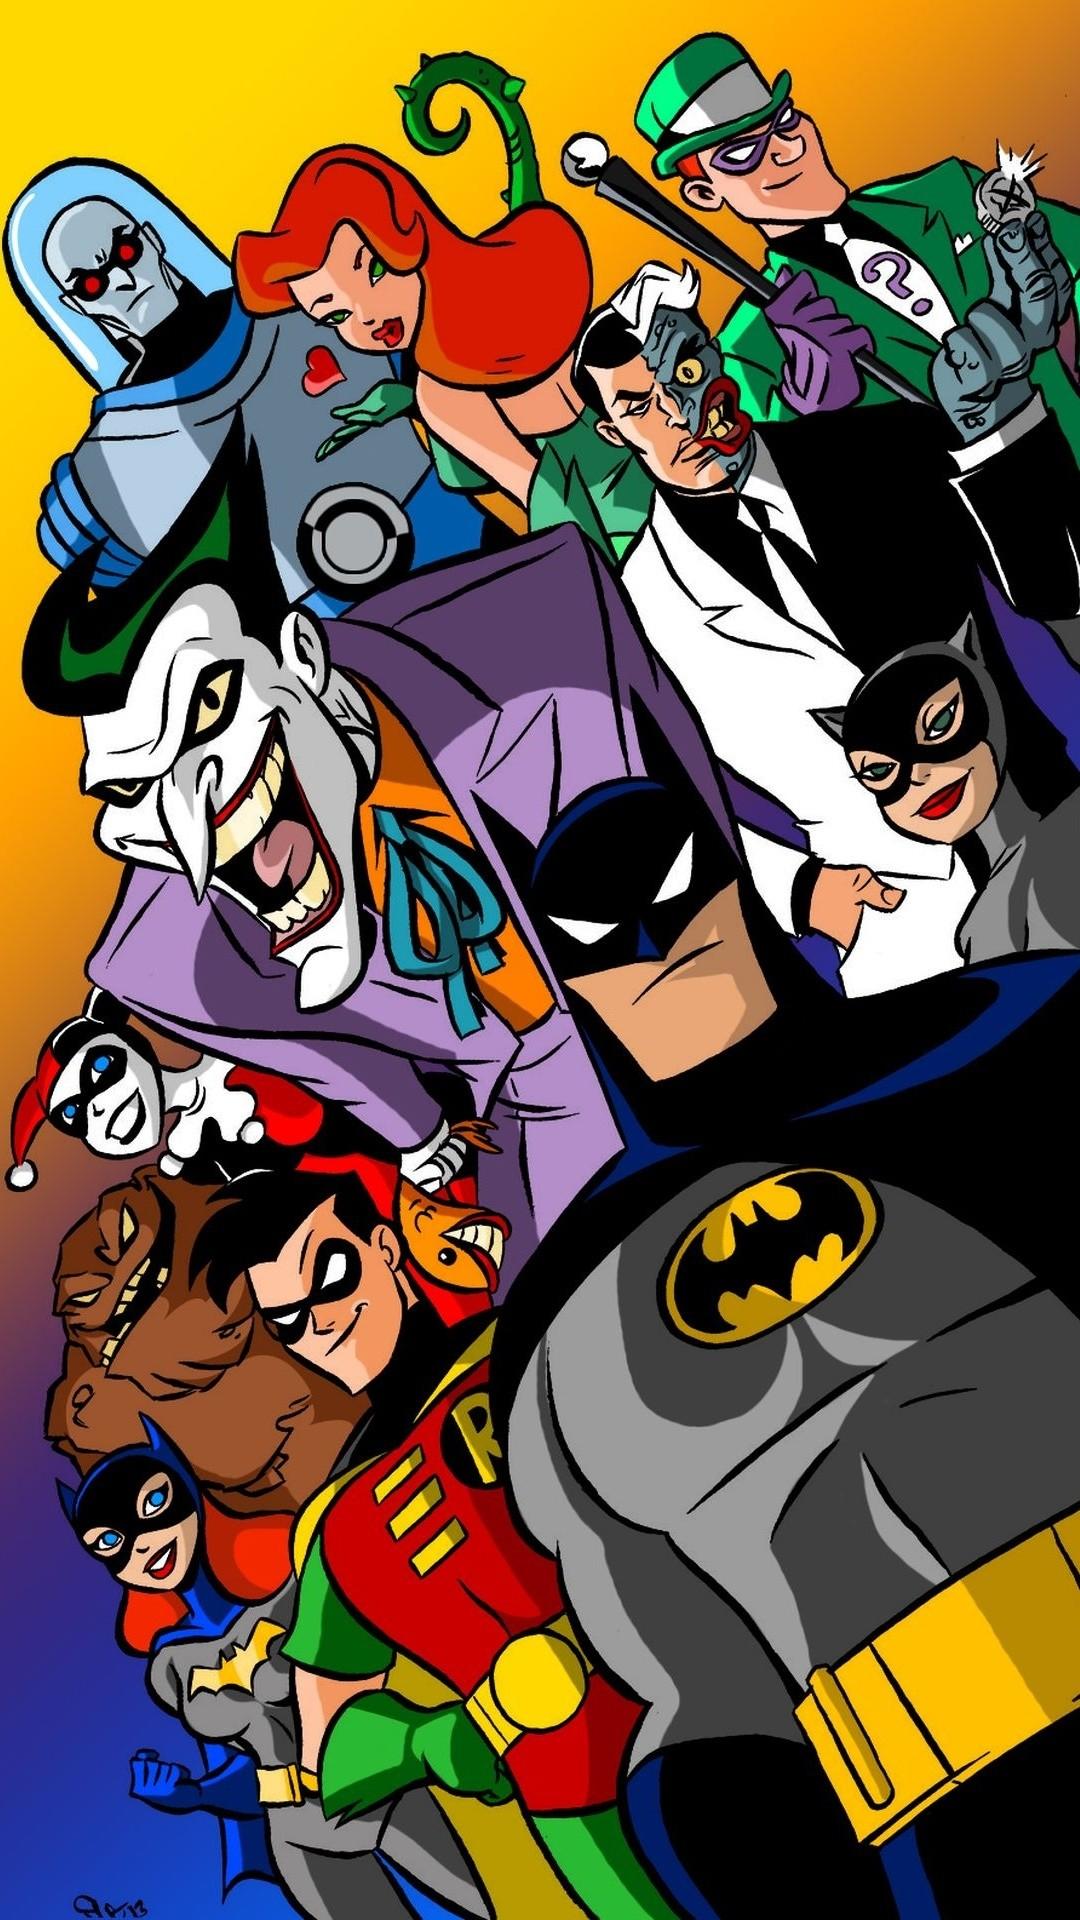 Res: 1080x1920, Popular Batman Cartoon Wallpaper Iphone 6 - batman-animated-series-iphone-6